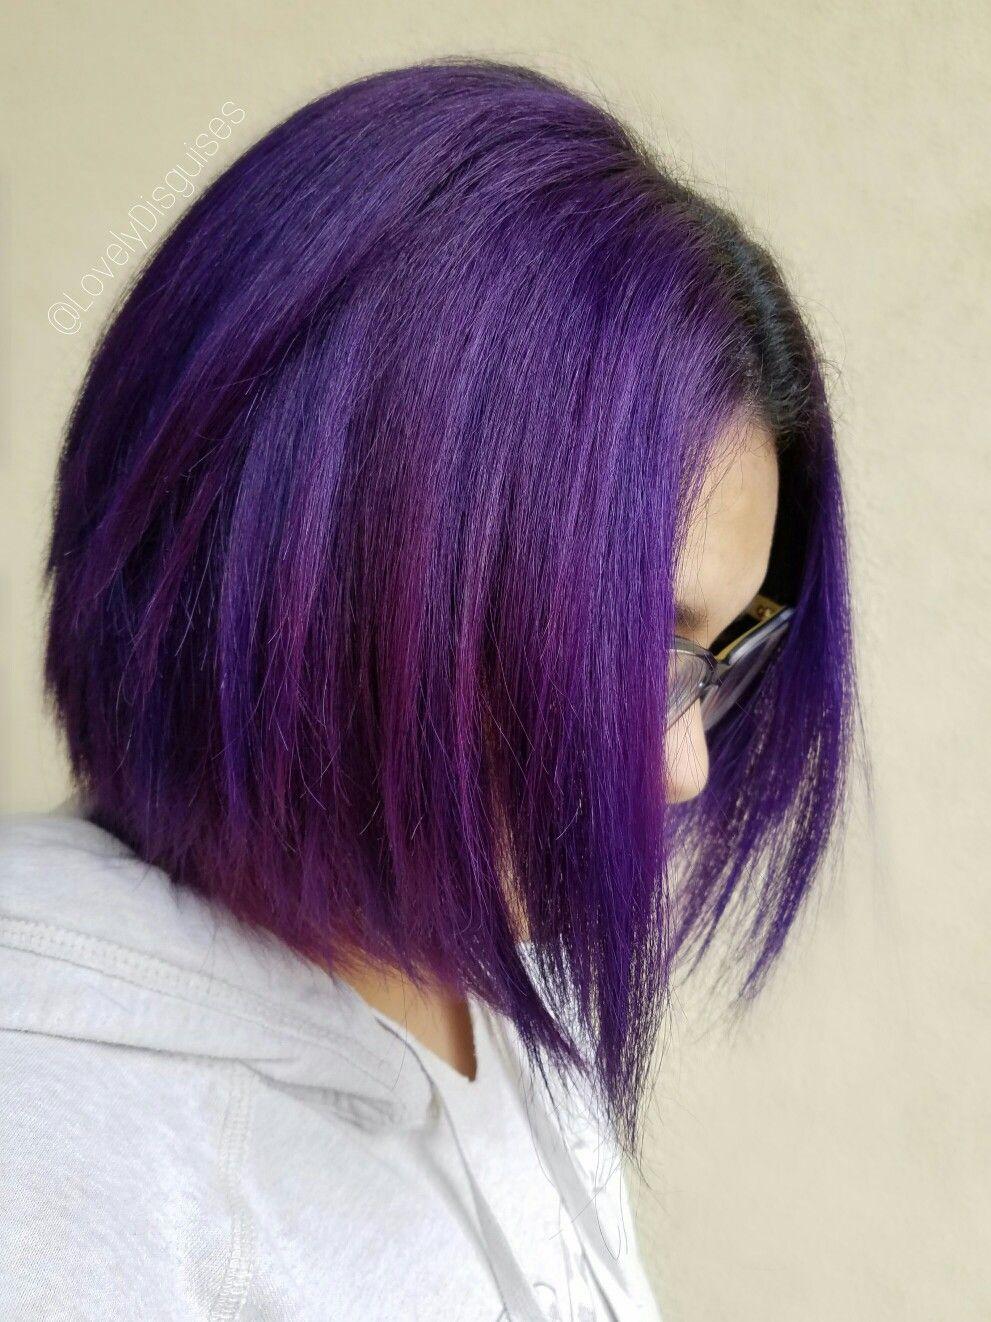 Purple hair bob sombré balayage ombré color melts highlights